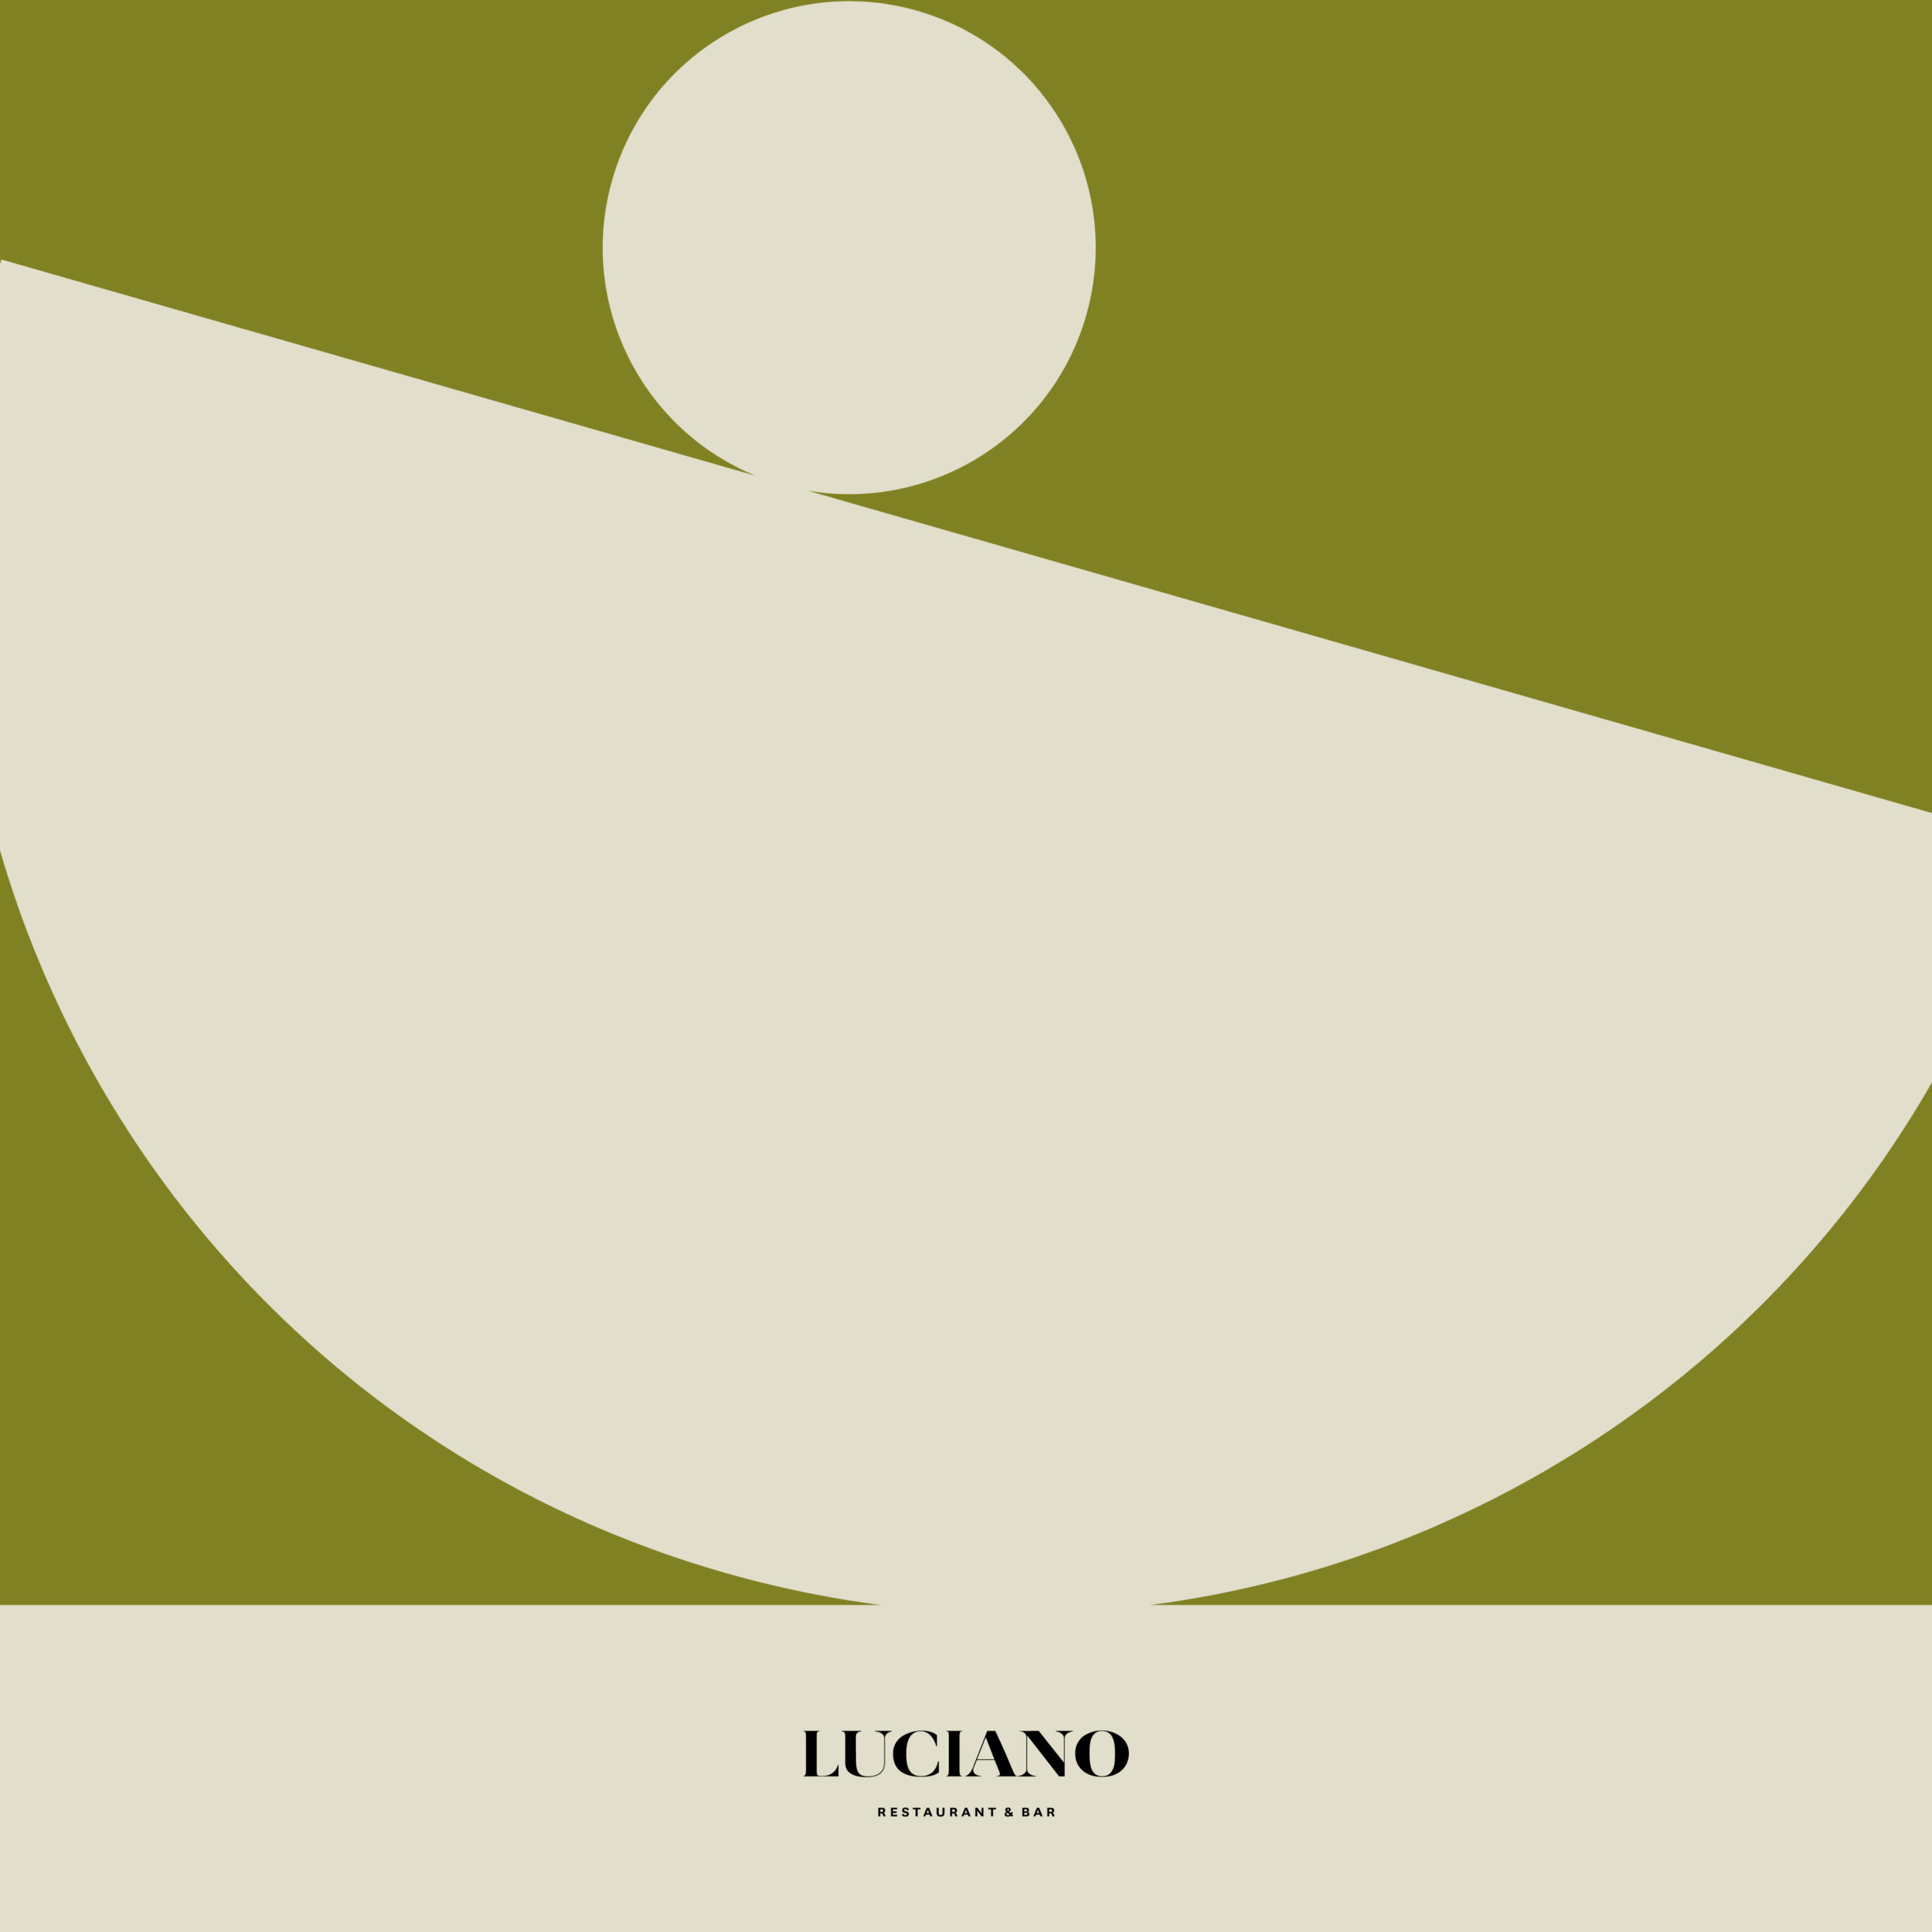 Luciano_ilustracija_3